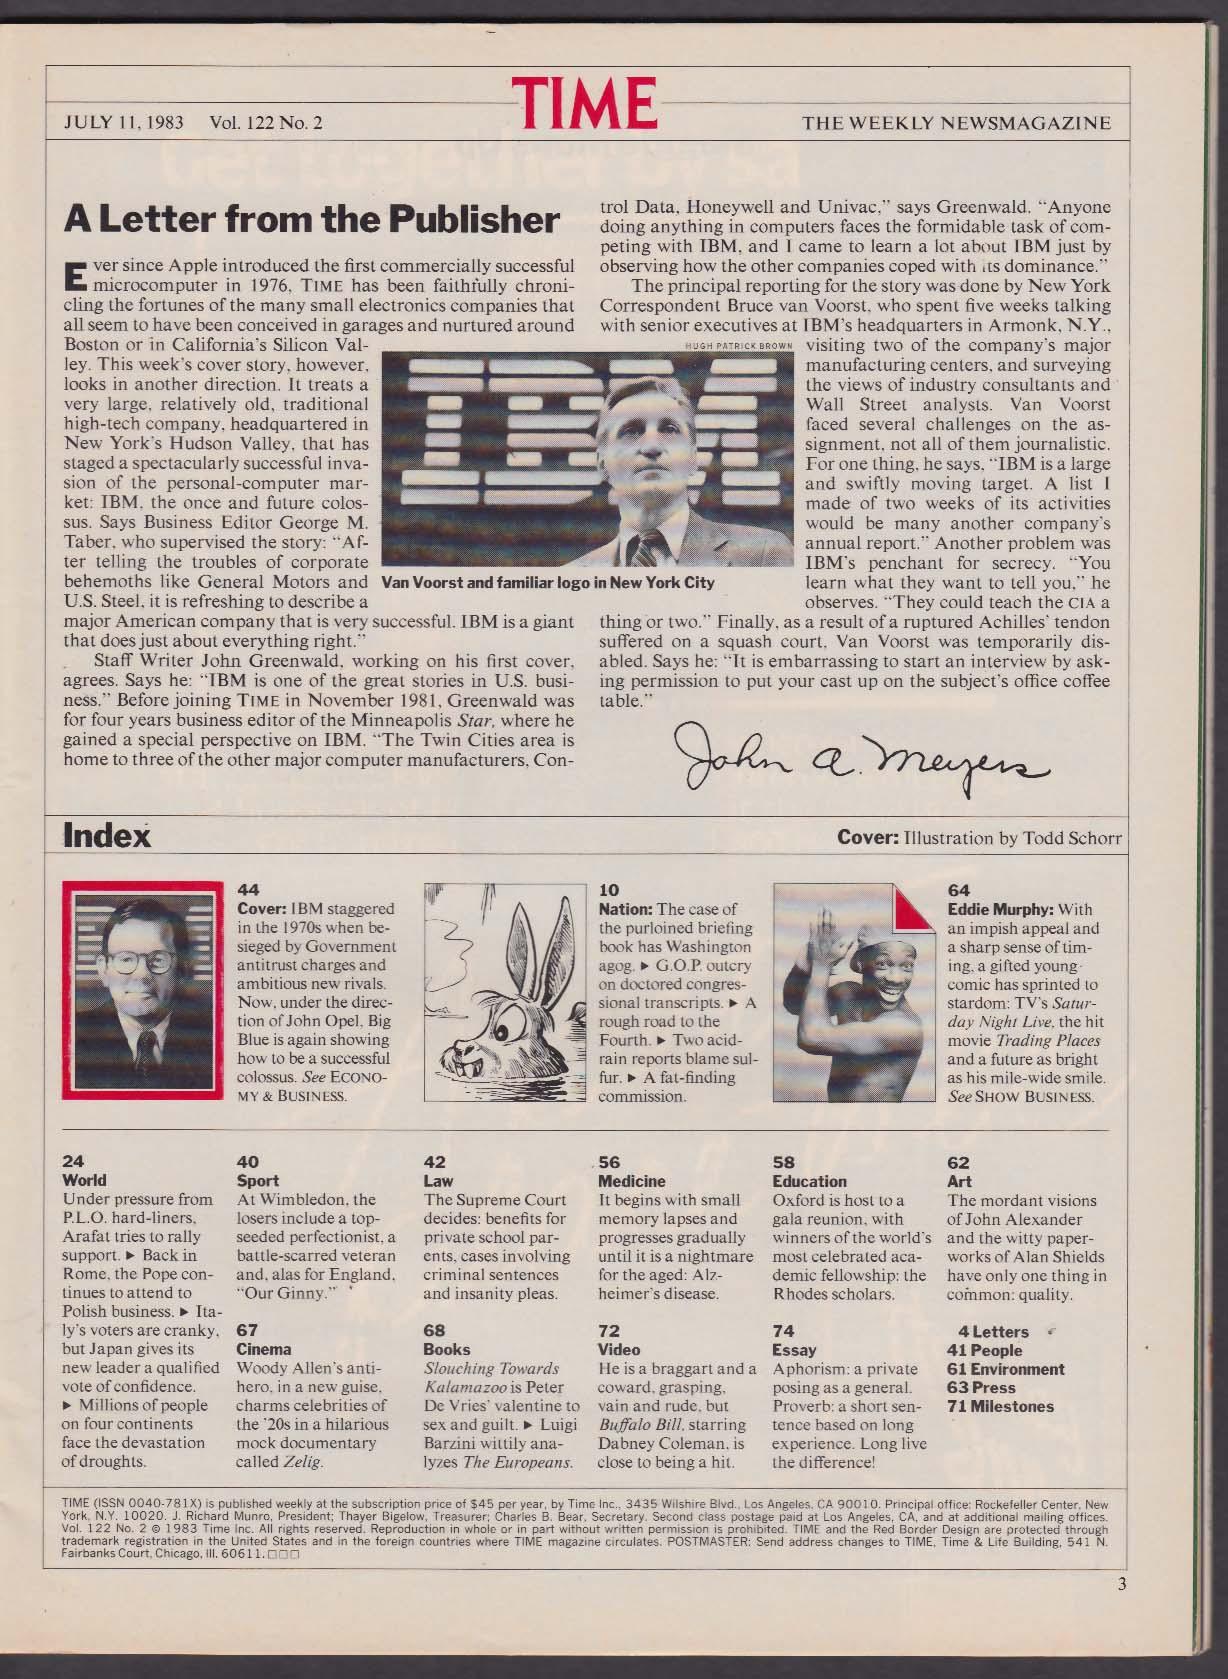 TIME IBM Chairman John Opel Eddie Murphy PLO Arafat Wimbledon 7/11 1983